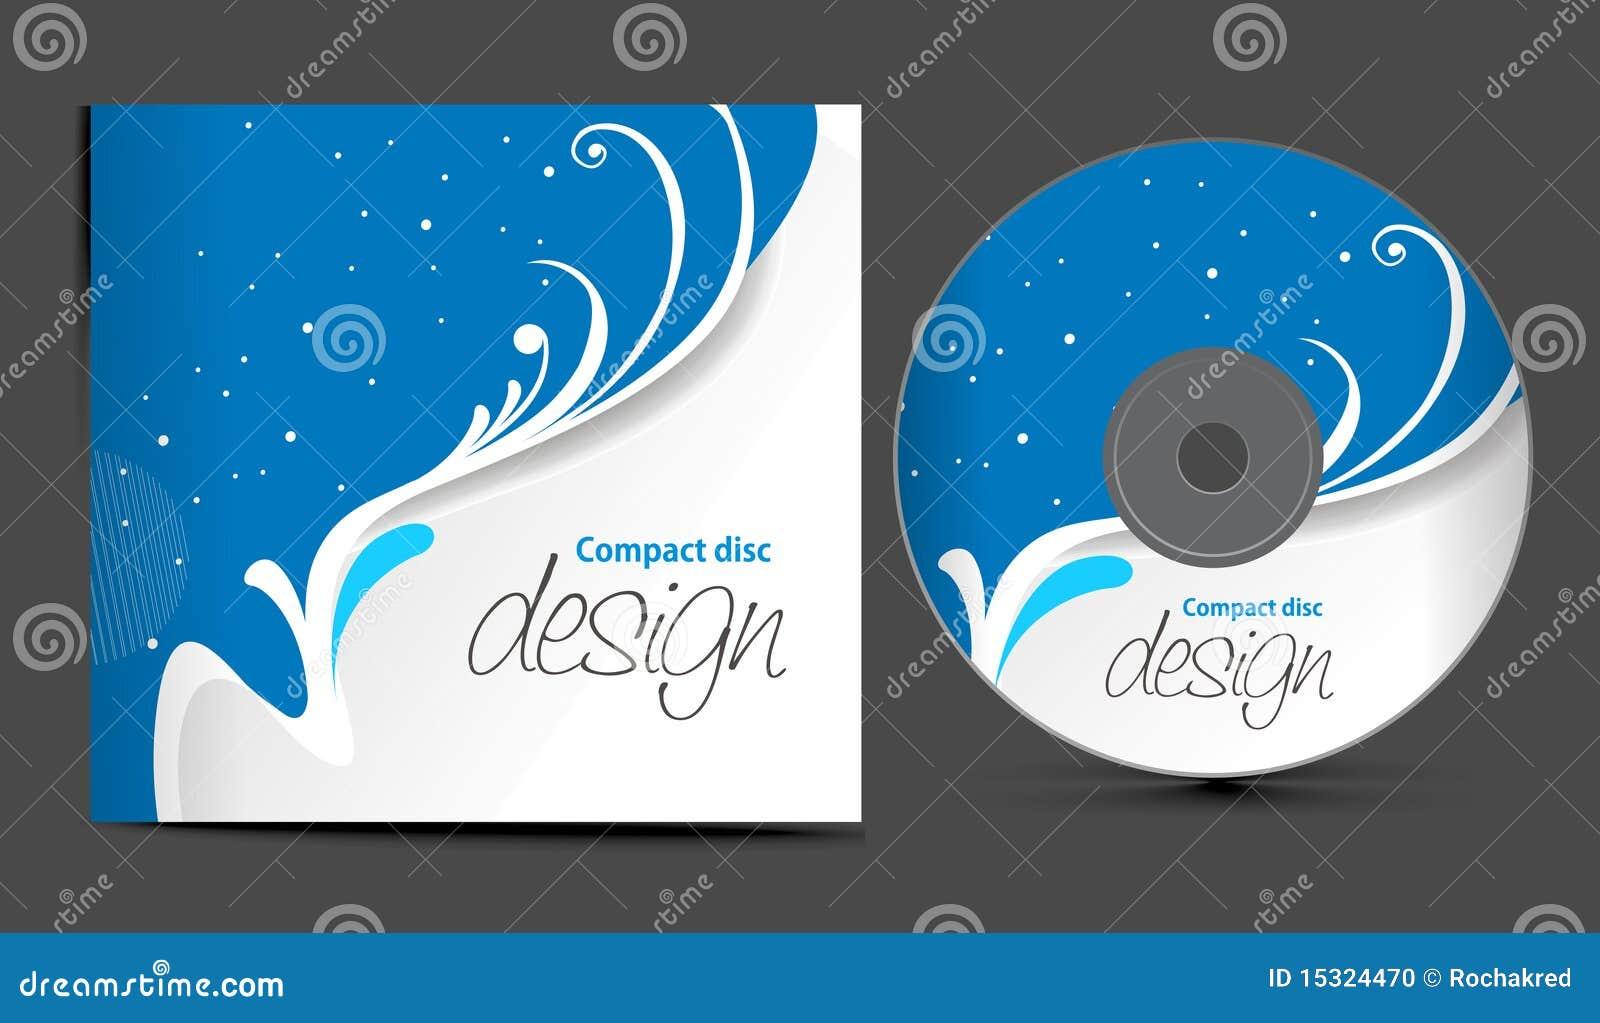 Cd Cover Design Stock Photo Image 15324470